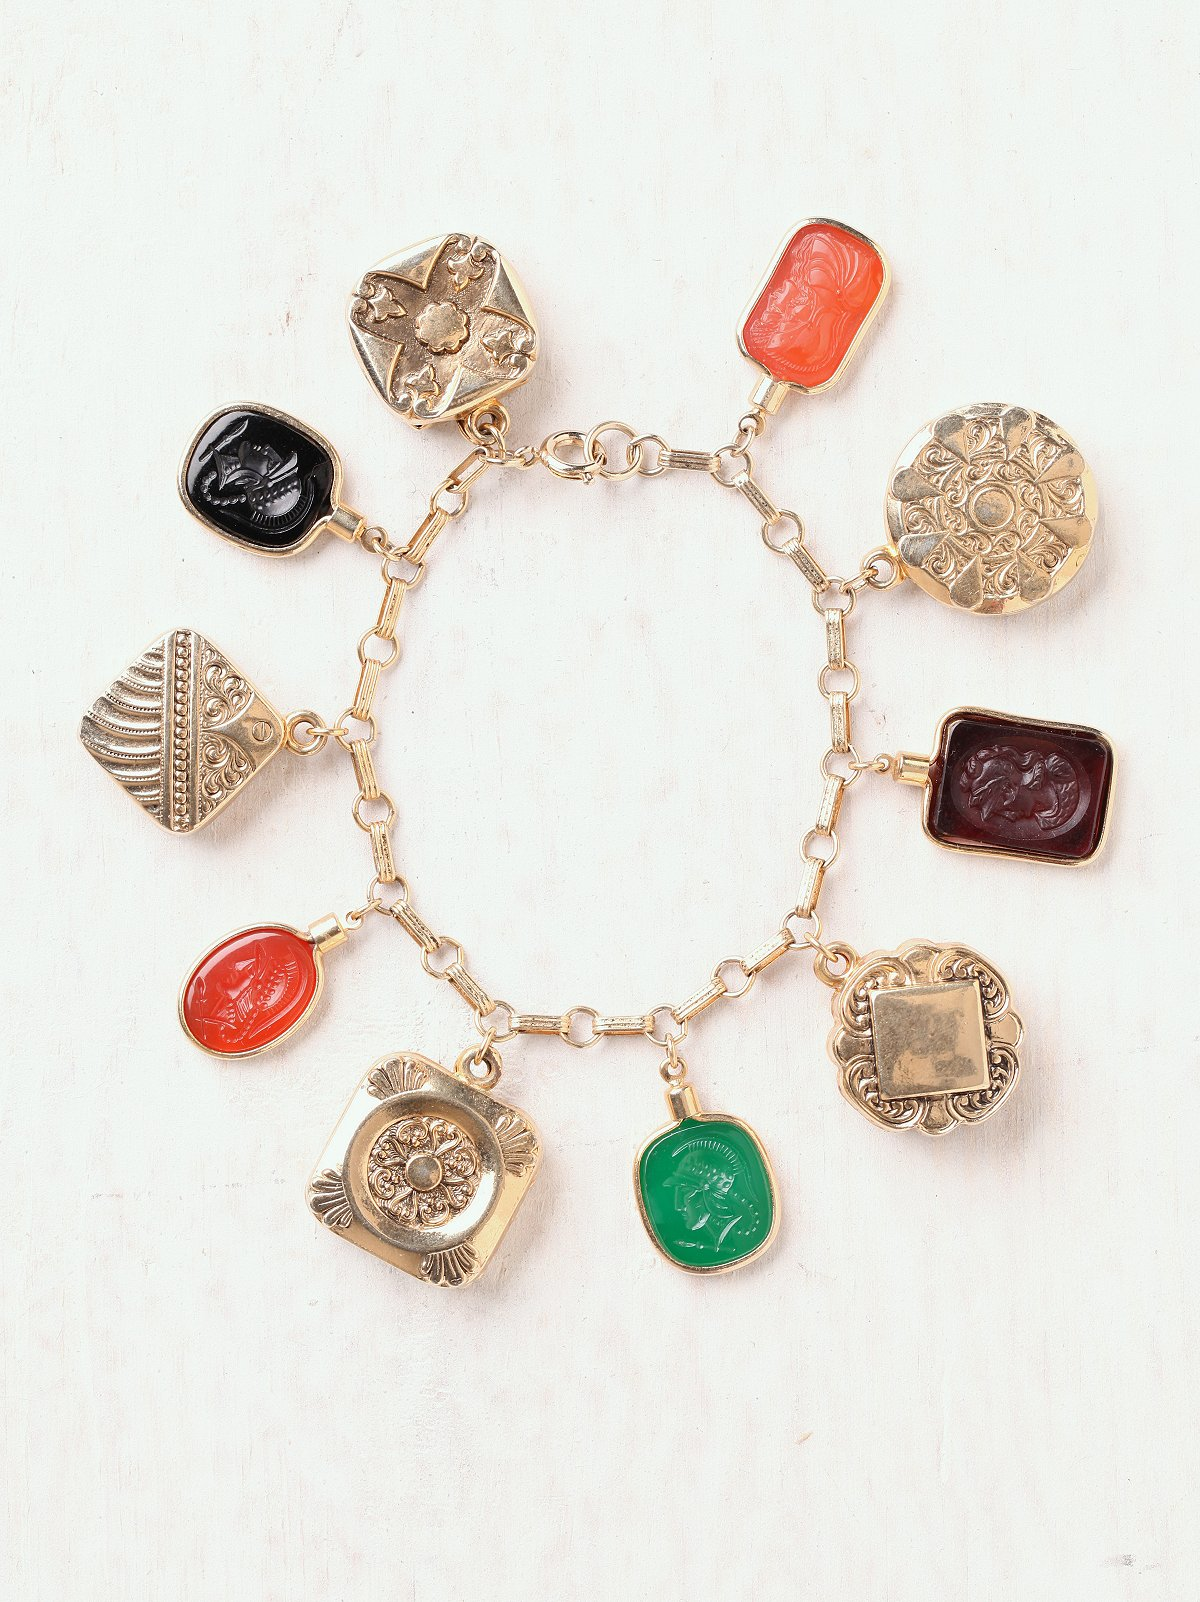 Vintage Intaglio Charm Bracelet